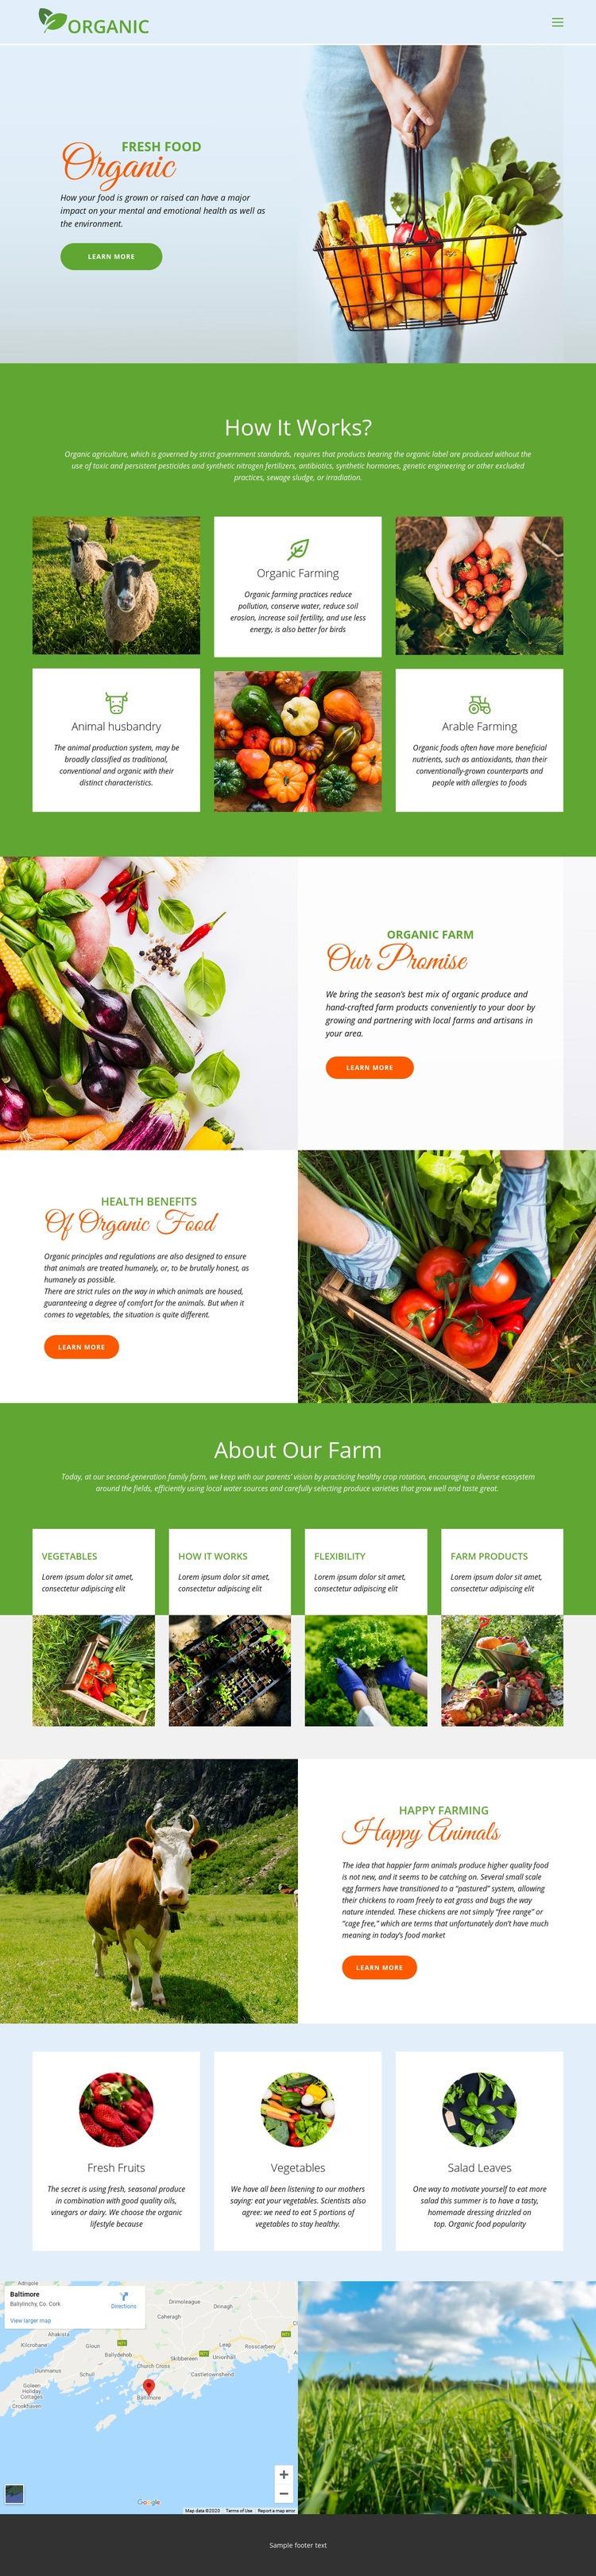 Eat best organic food Html Code Example